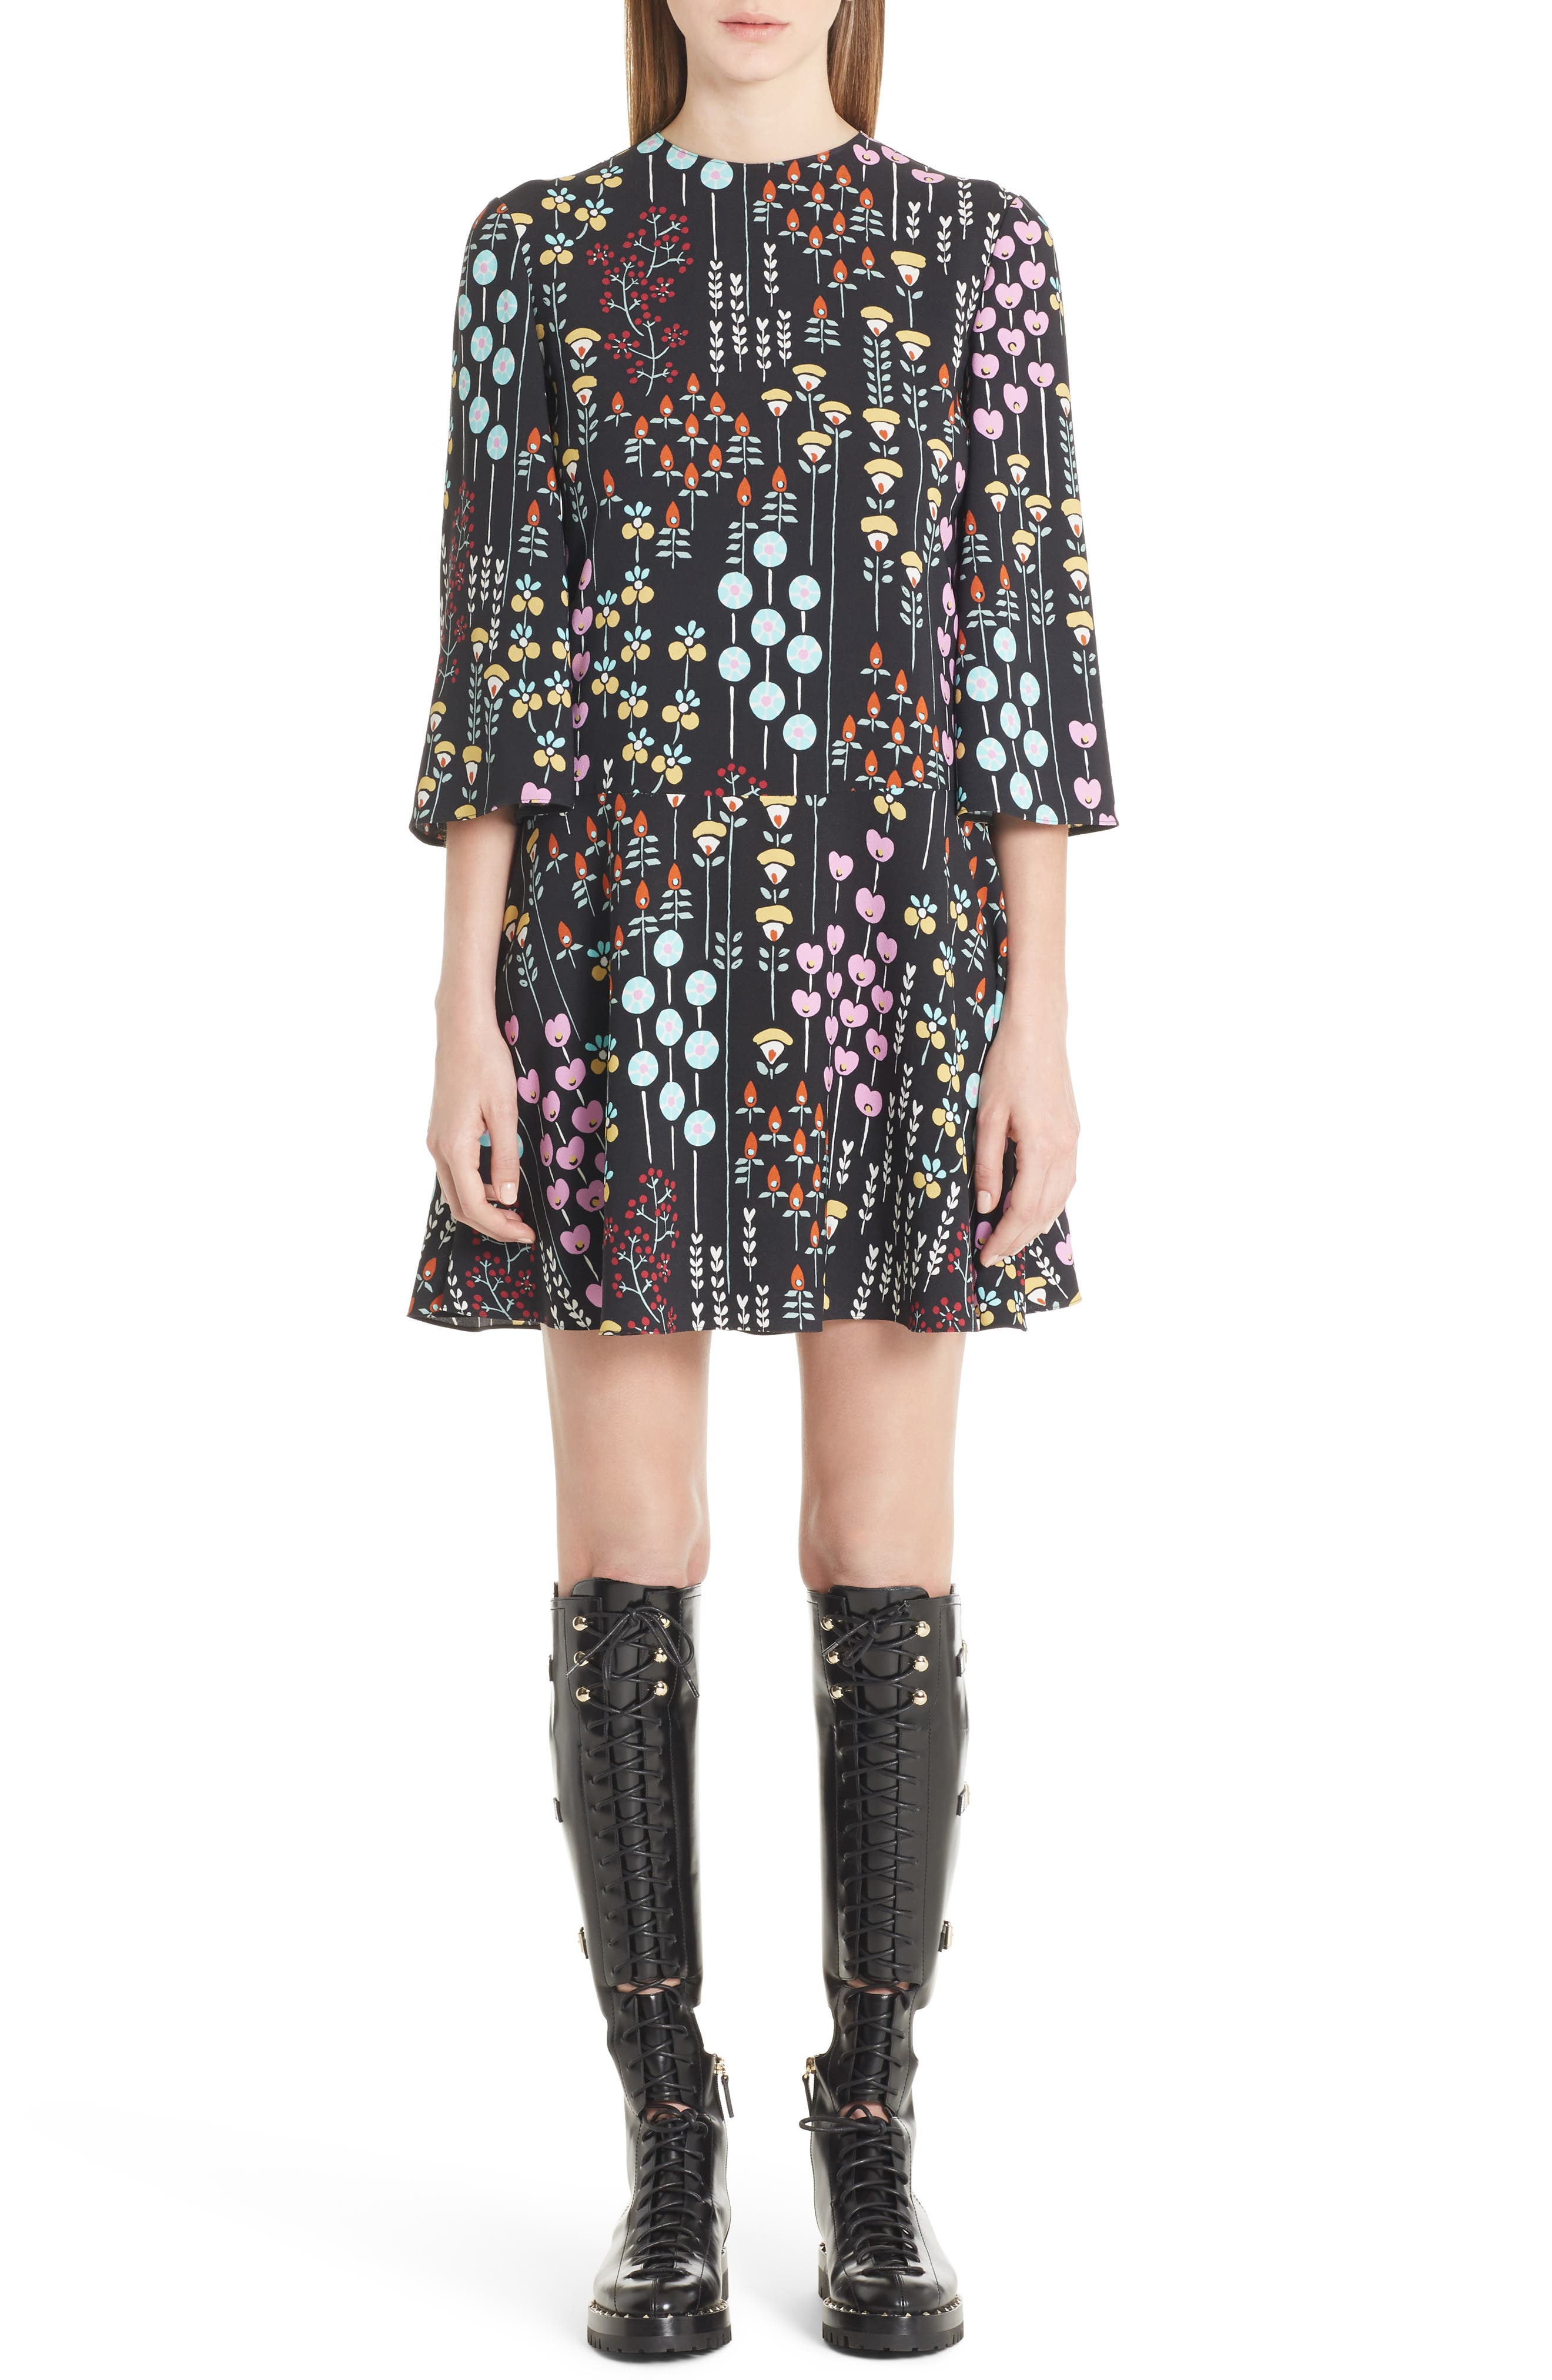 Valentino Floral Stem Print Dress